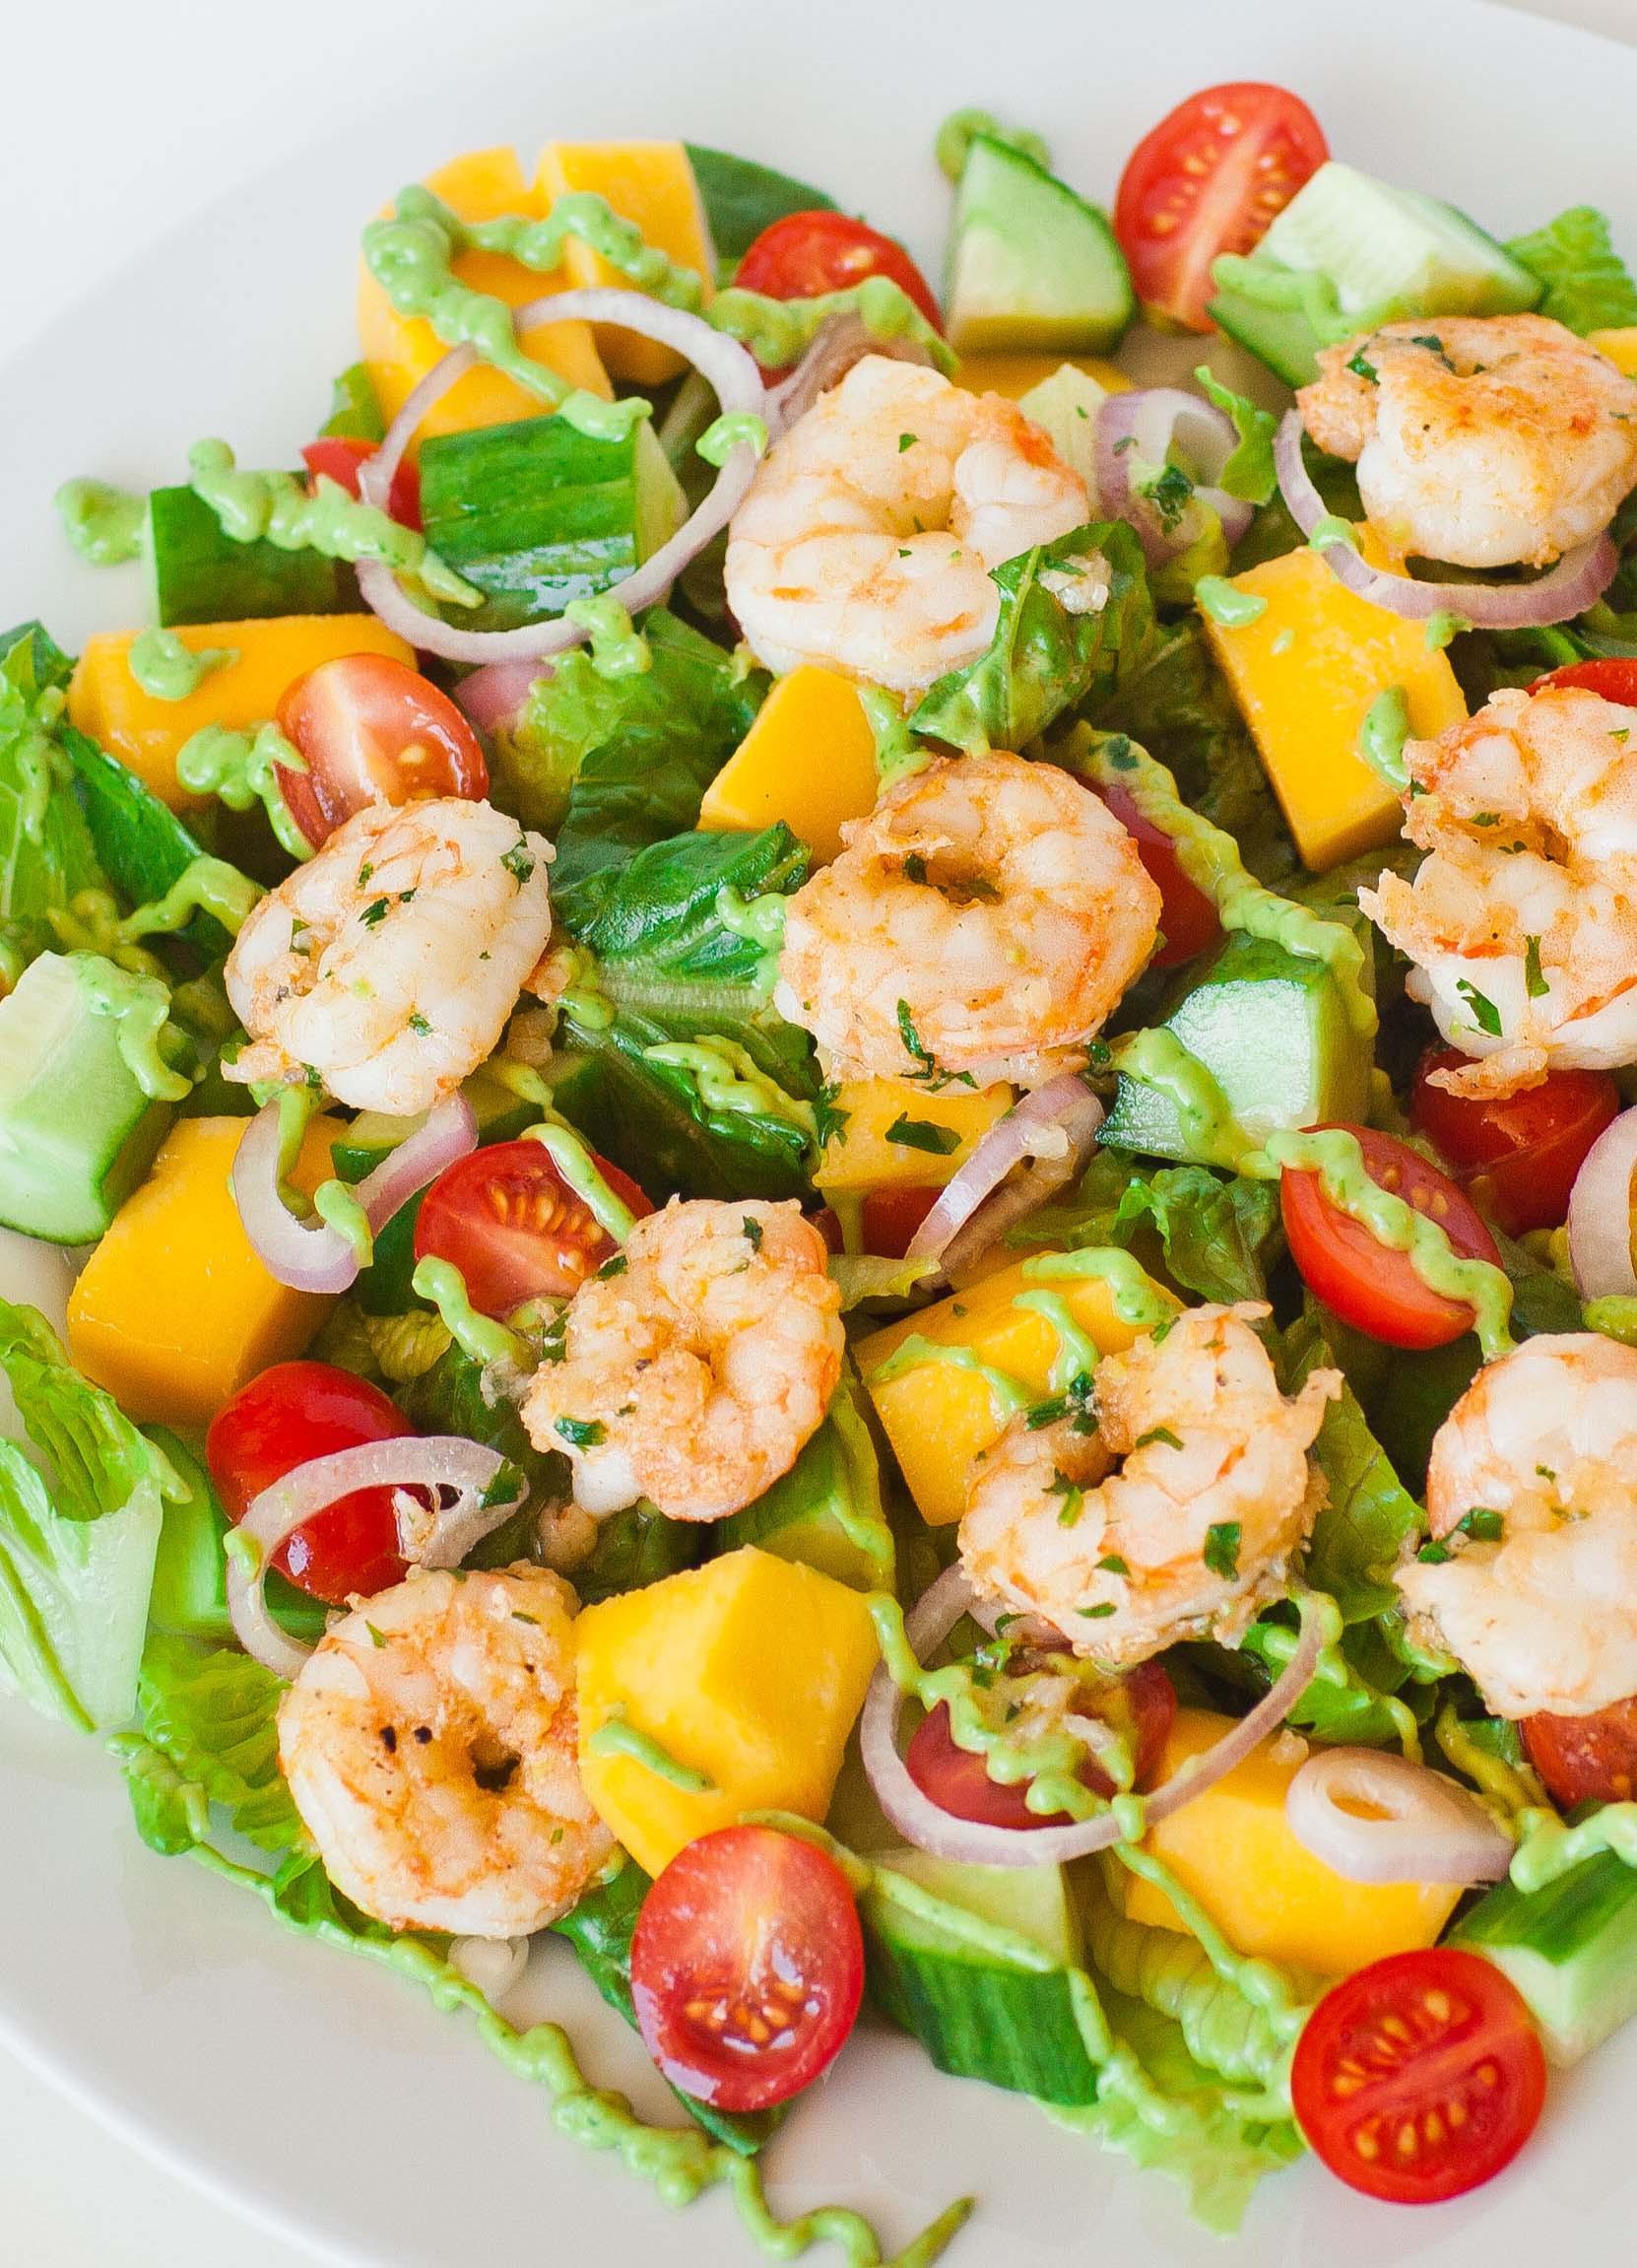 Shrimp Salad Dressings  Shrimp Salad with Avocado Dressing Tatyanas Everyday Food